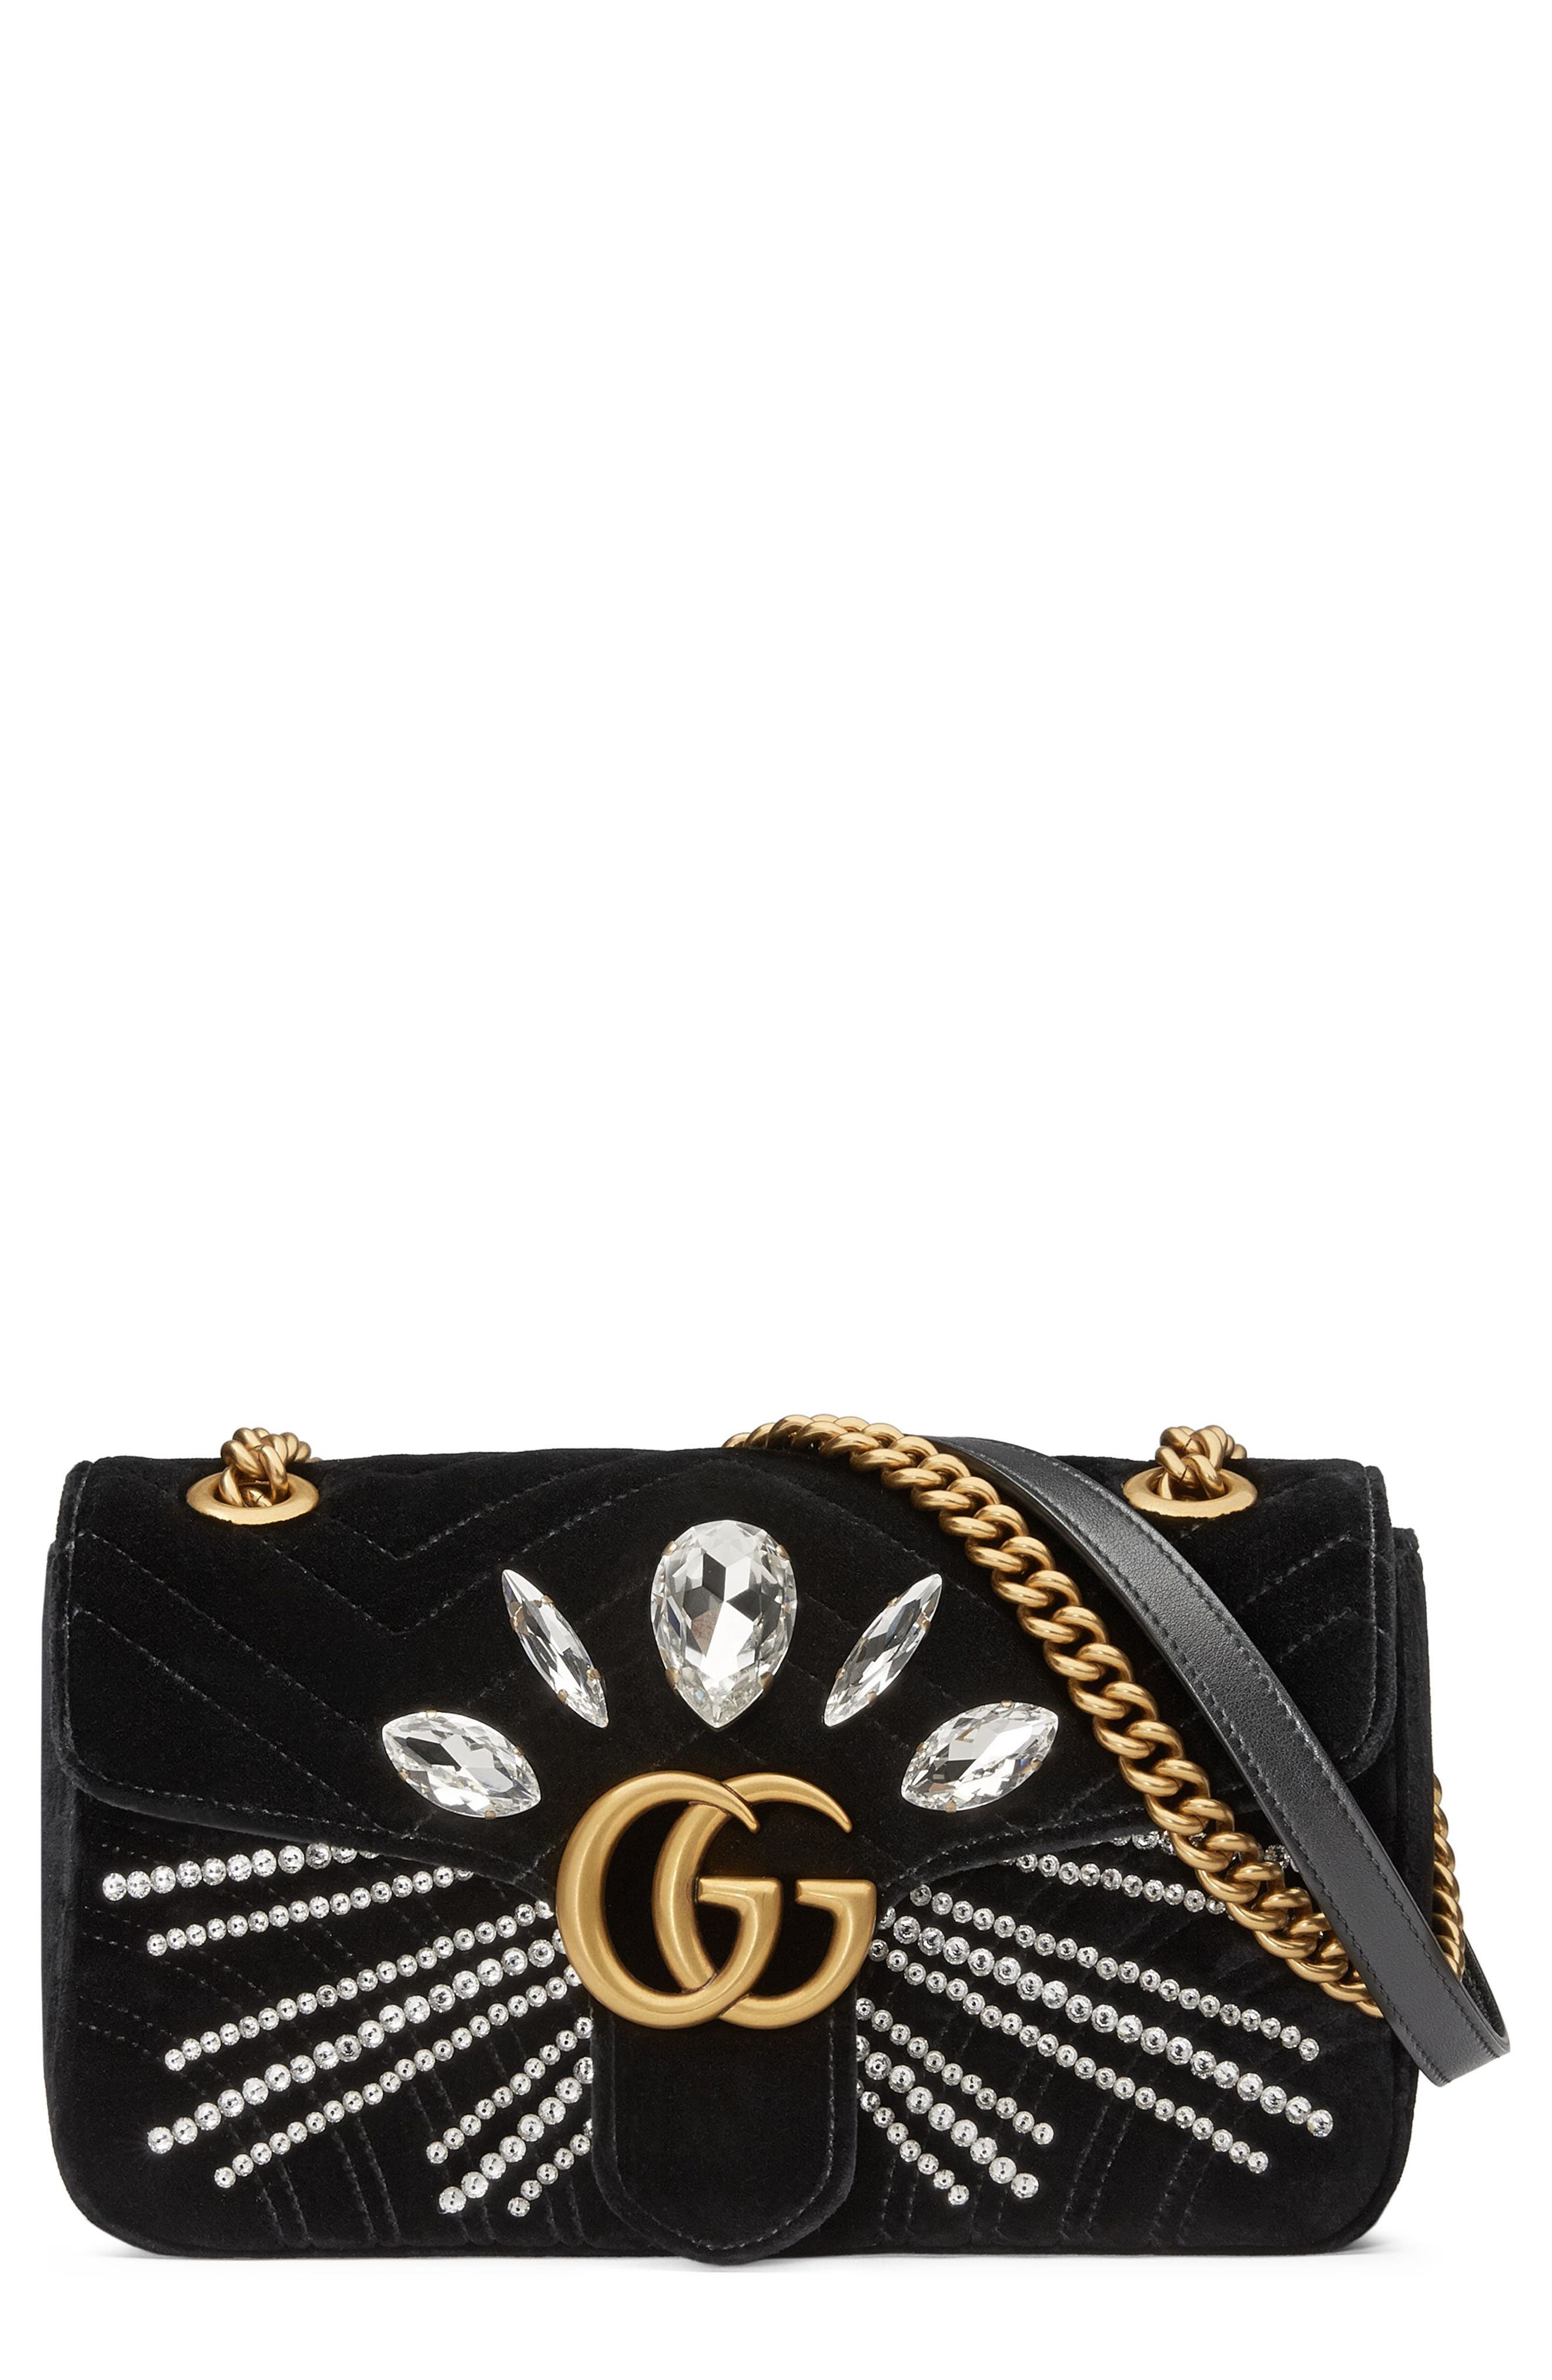 GG Marmont 2.0 Crystal Embellished Velvet Crossbody Bag,                             Main thumbnail 1, color,                             NERO/ CRYSTAL